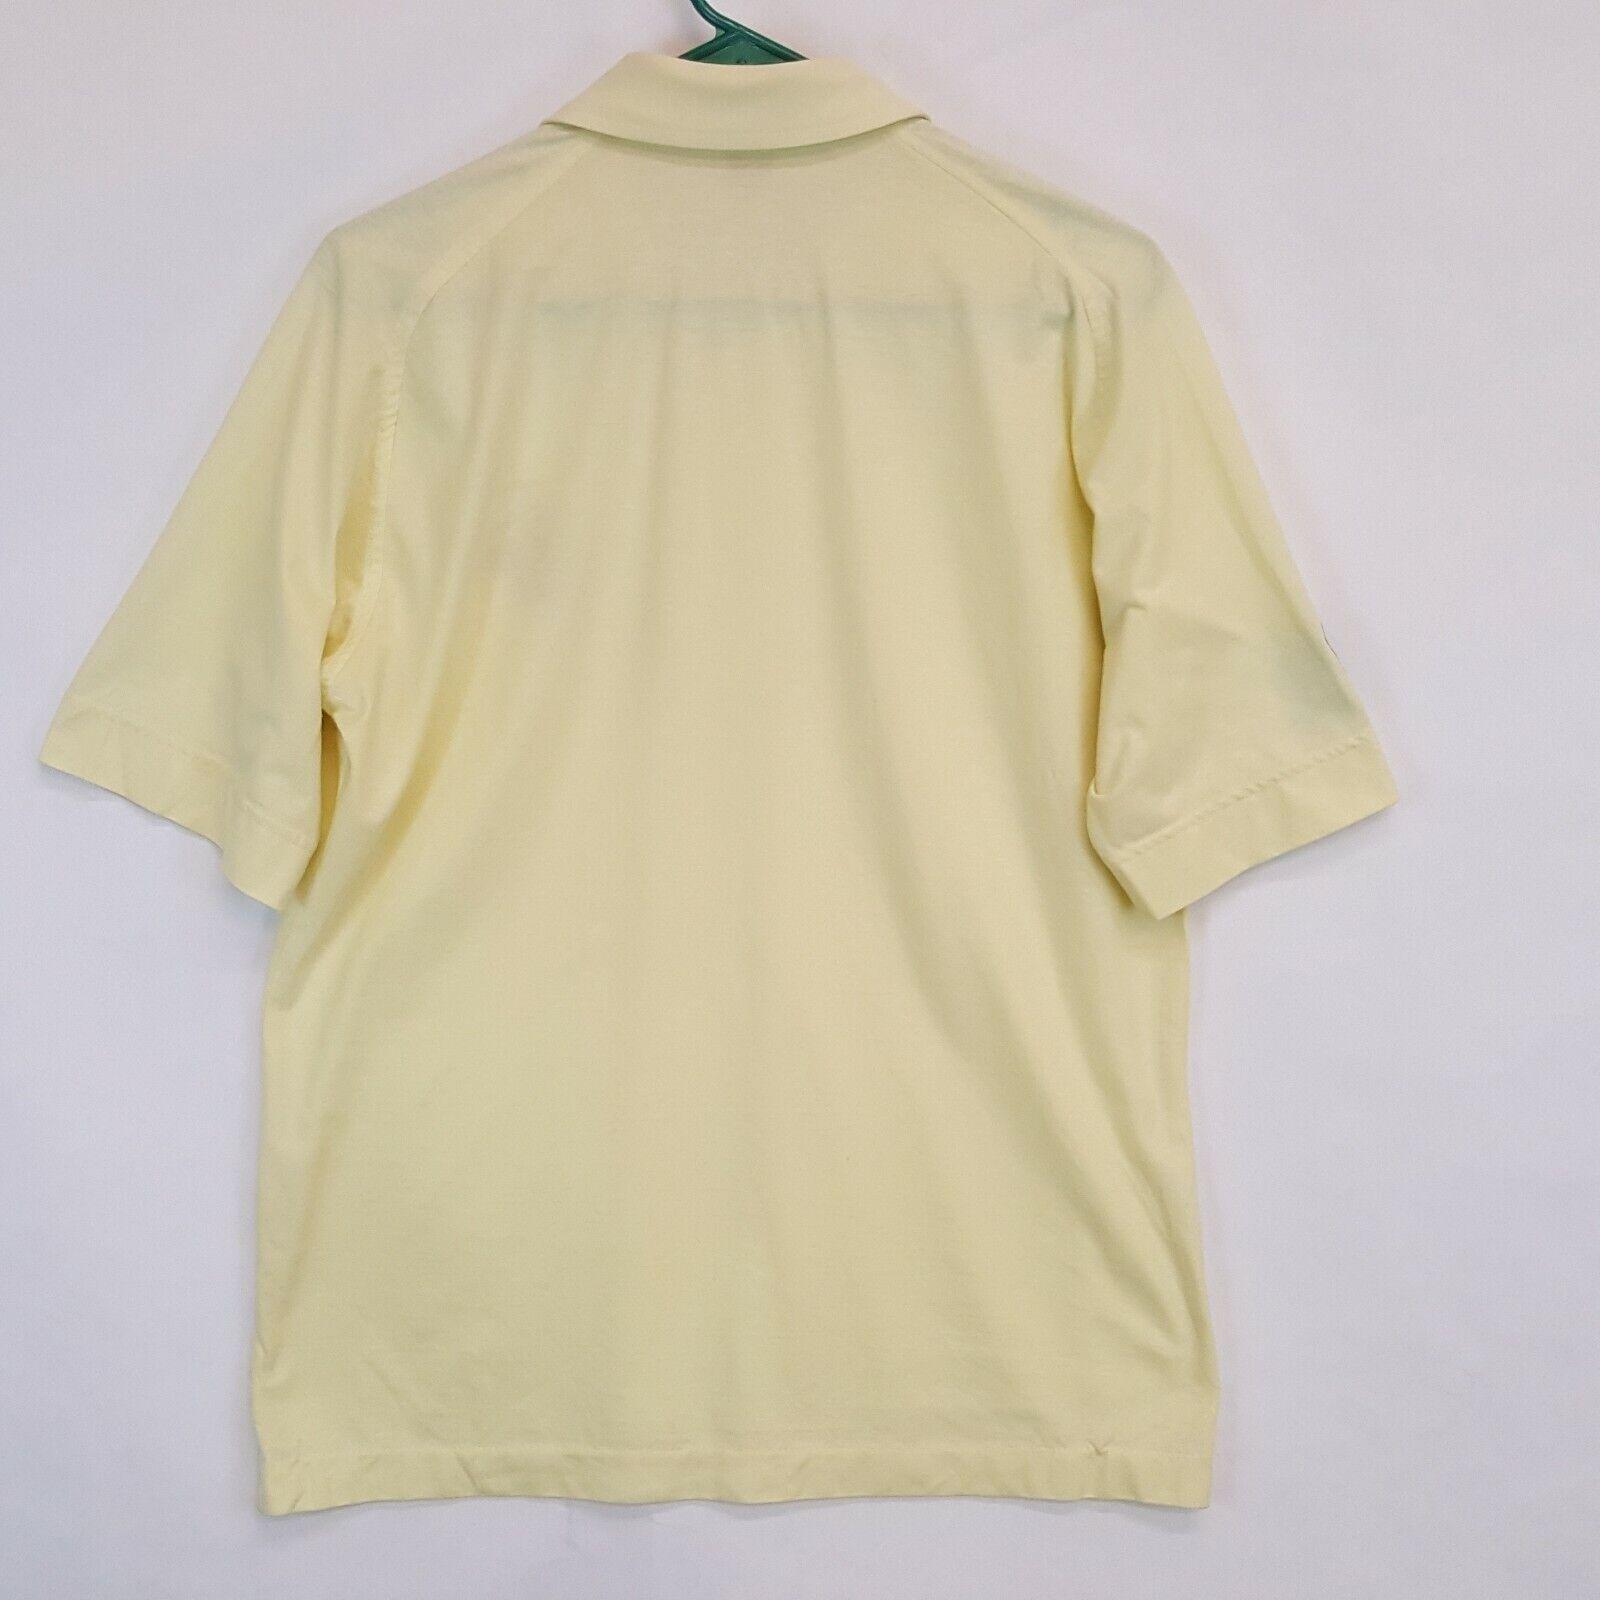 VTG 80s UO Oregon Ducks Antigua Pac 10 Polo Shirt… - image 8